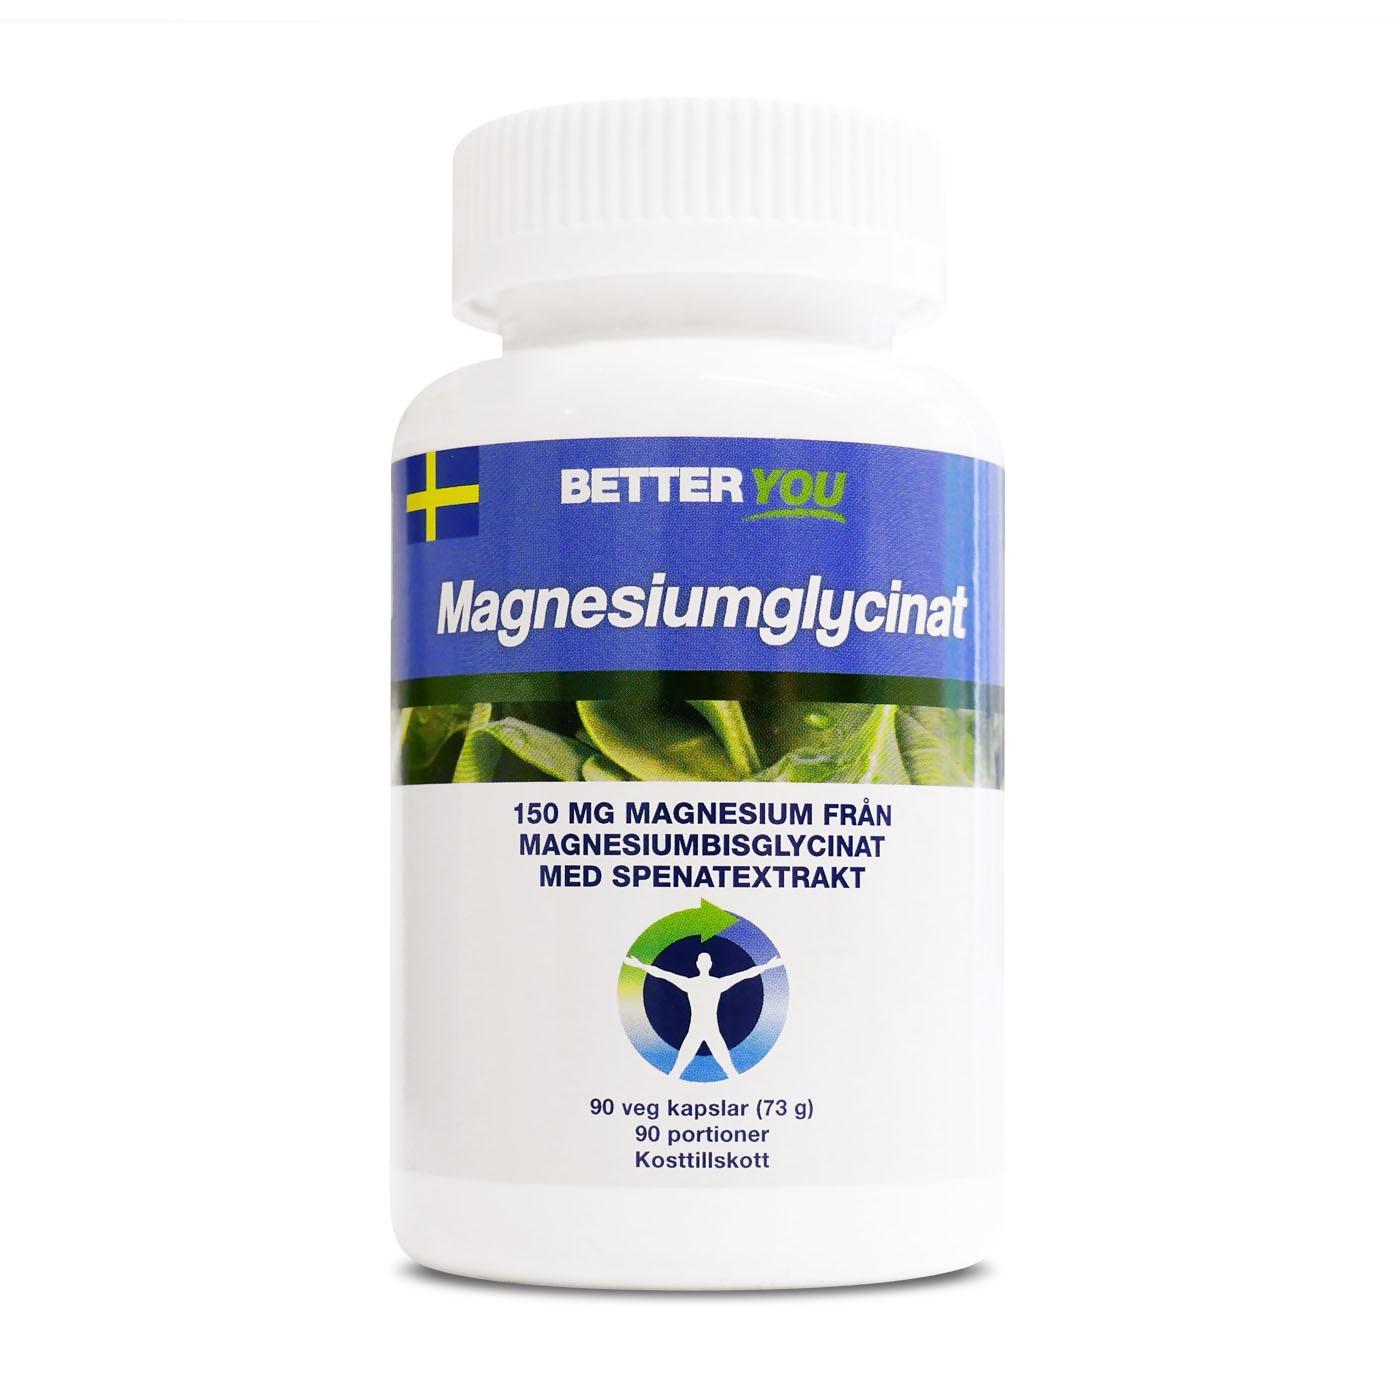 Magnesiumglycinat